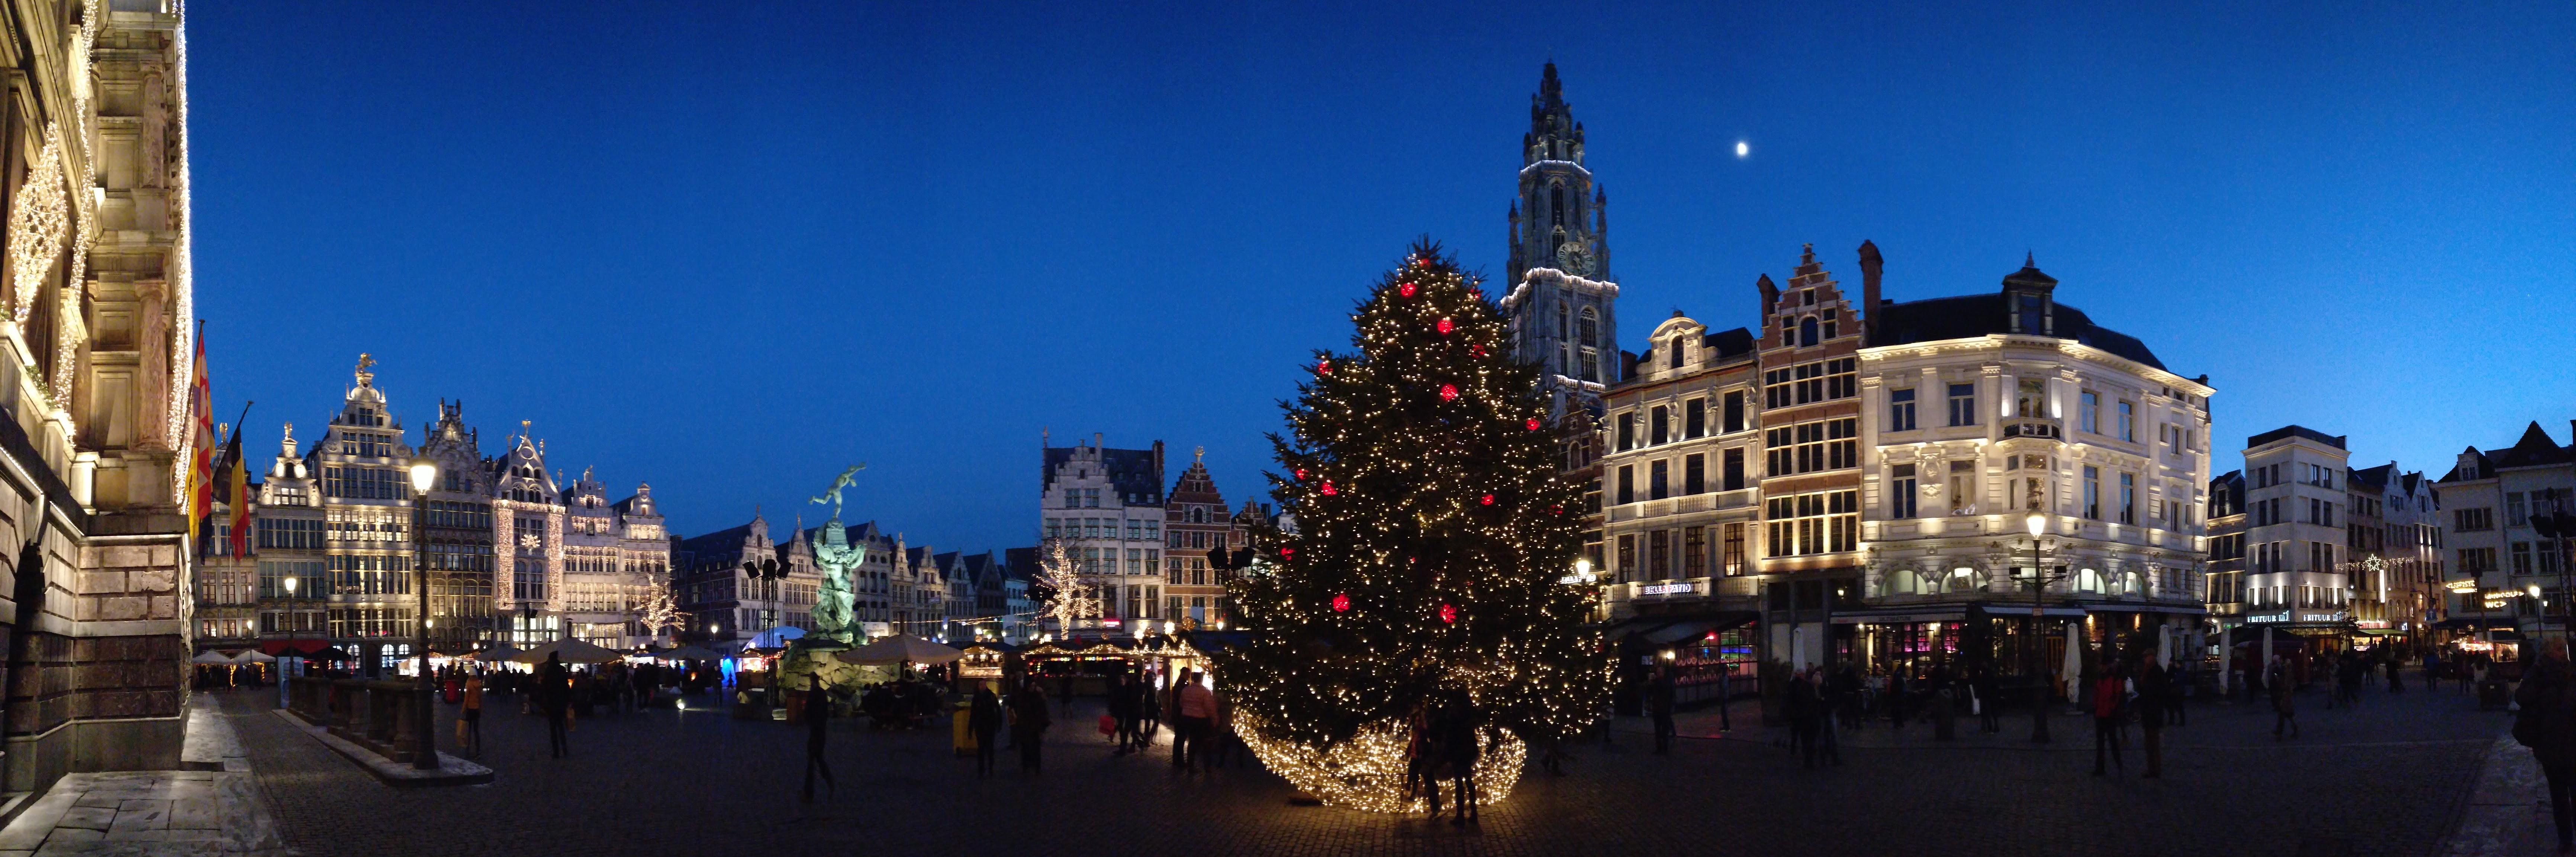 Antwerpen: market place